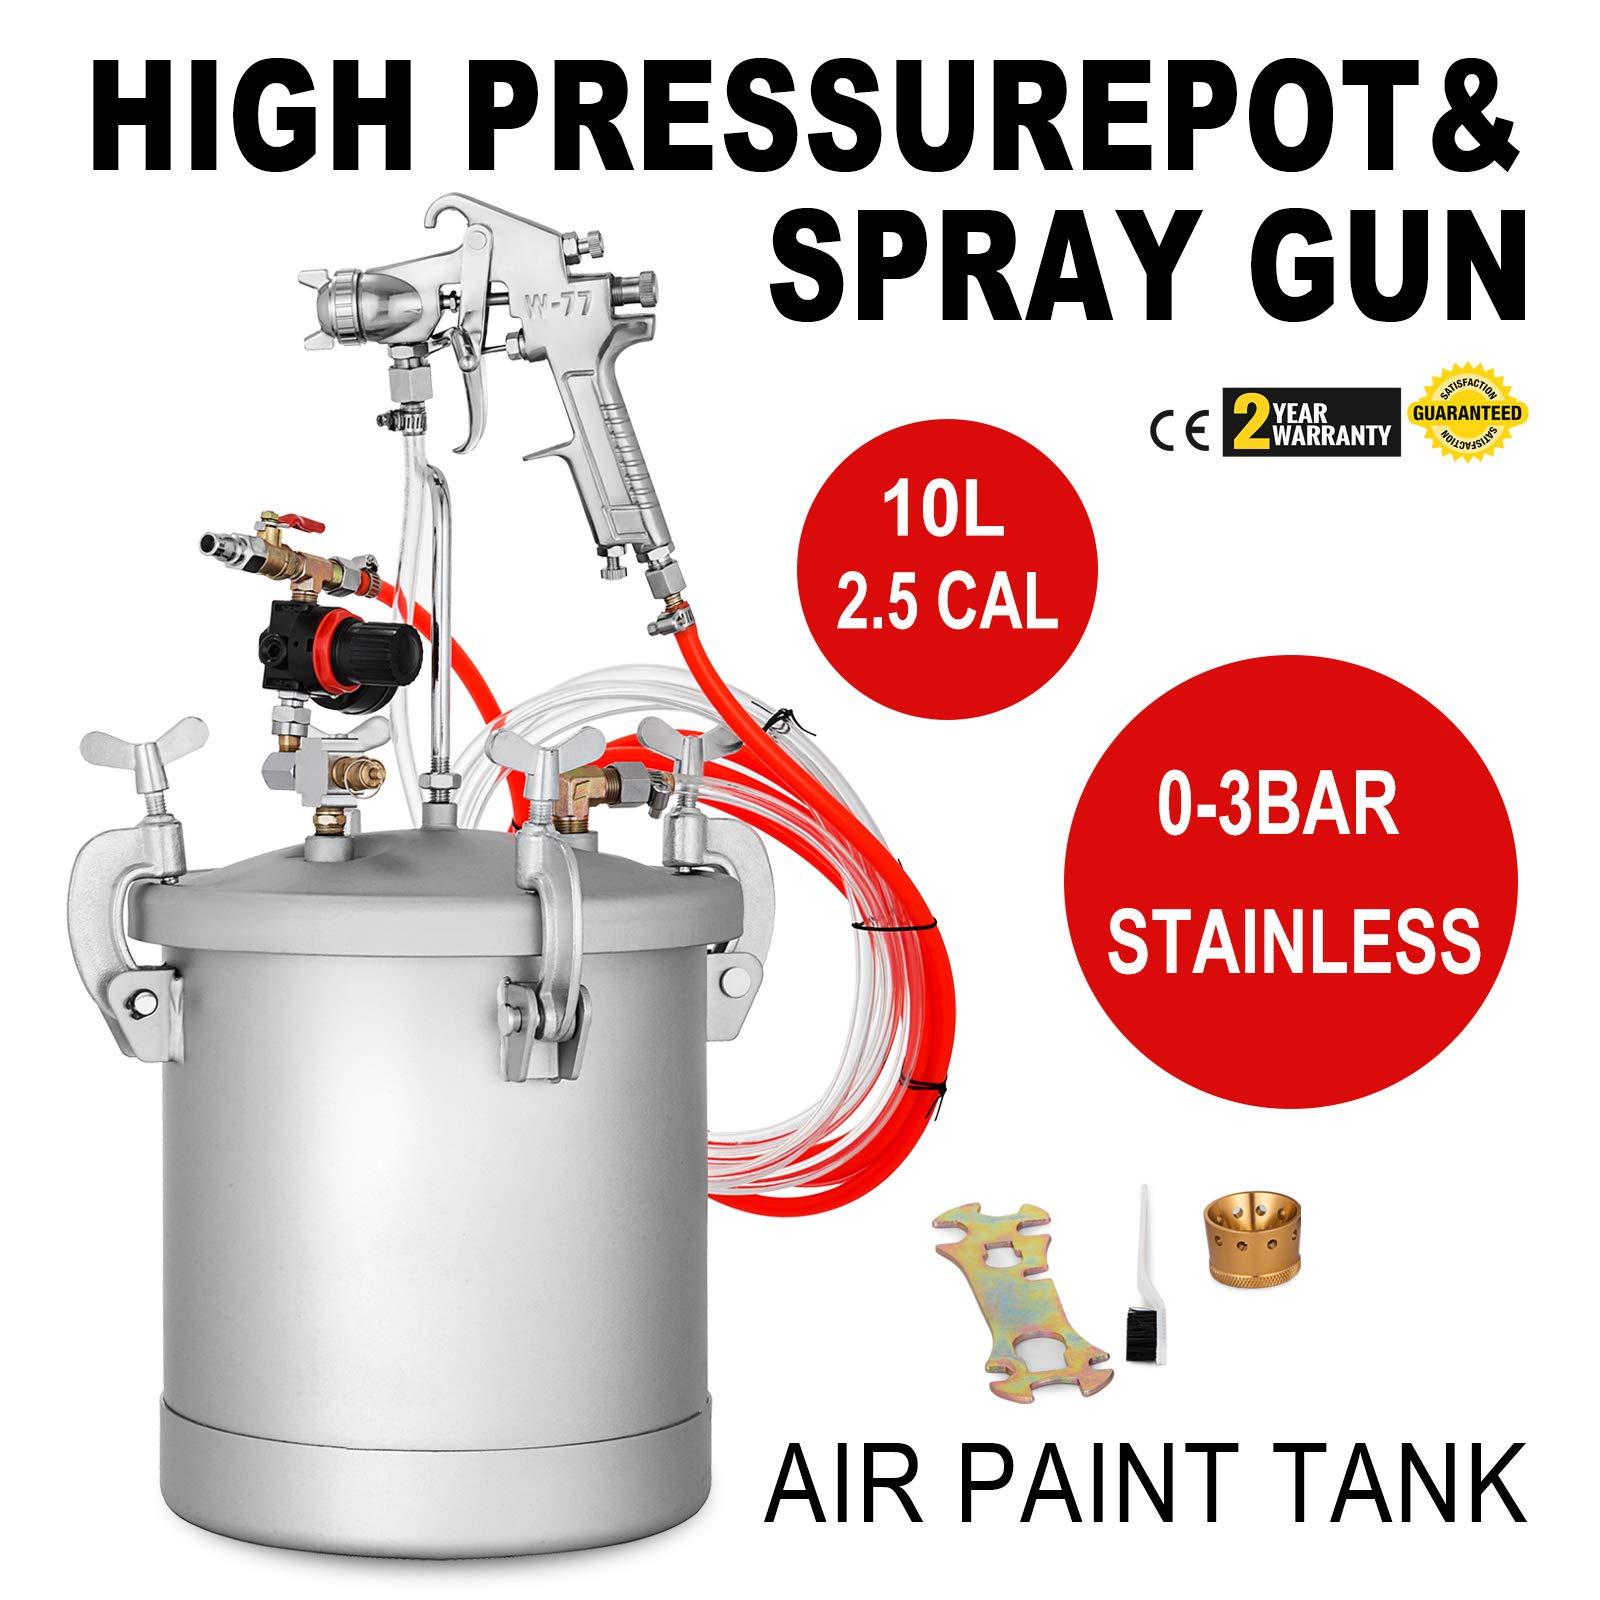 VEVOR Pressure Pot Tank 10L / 2.5 Gallon Paint Pressure Pot Stainless Paint Tank with 2.5mm Nozzle Spray Guns and Paint Hose (10L 2.5mm)